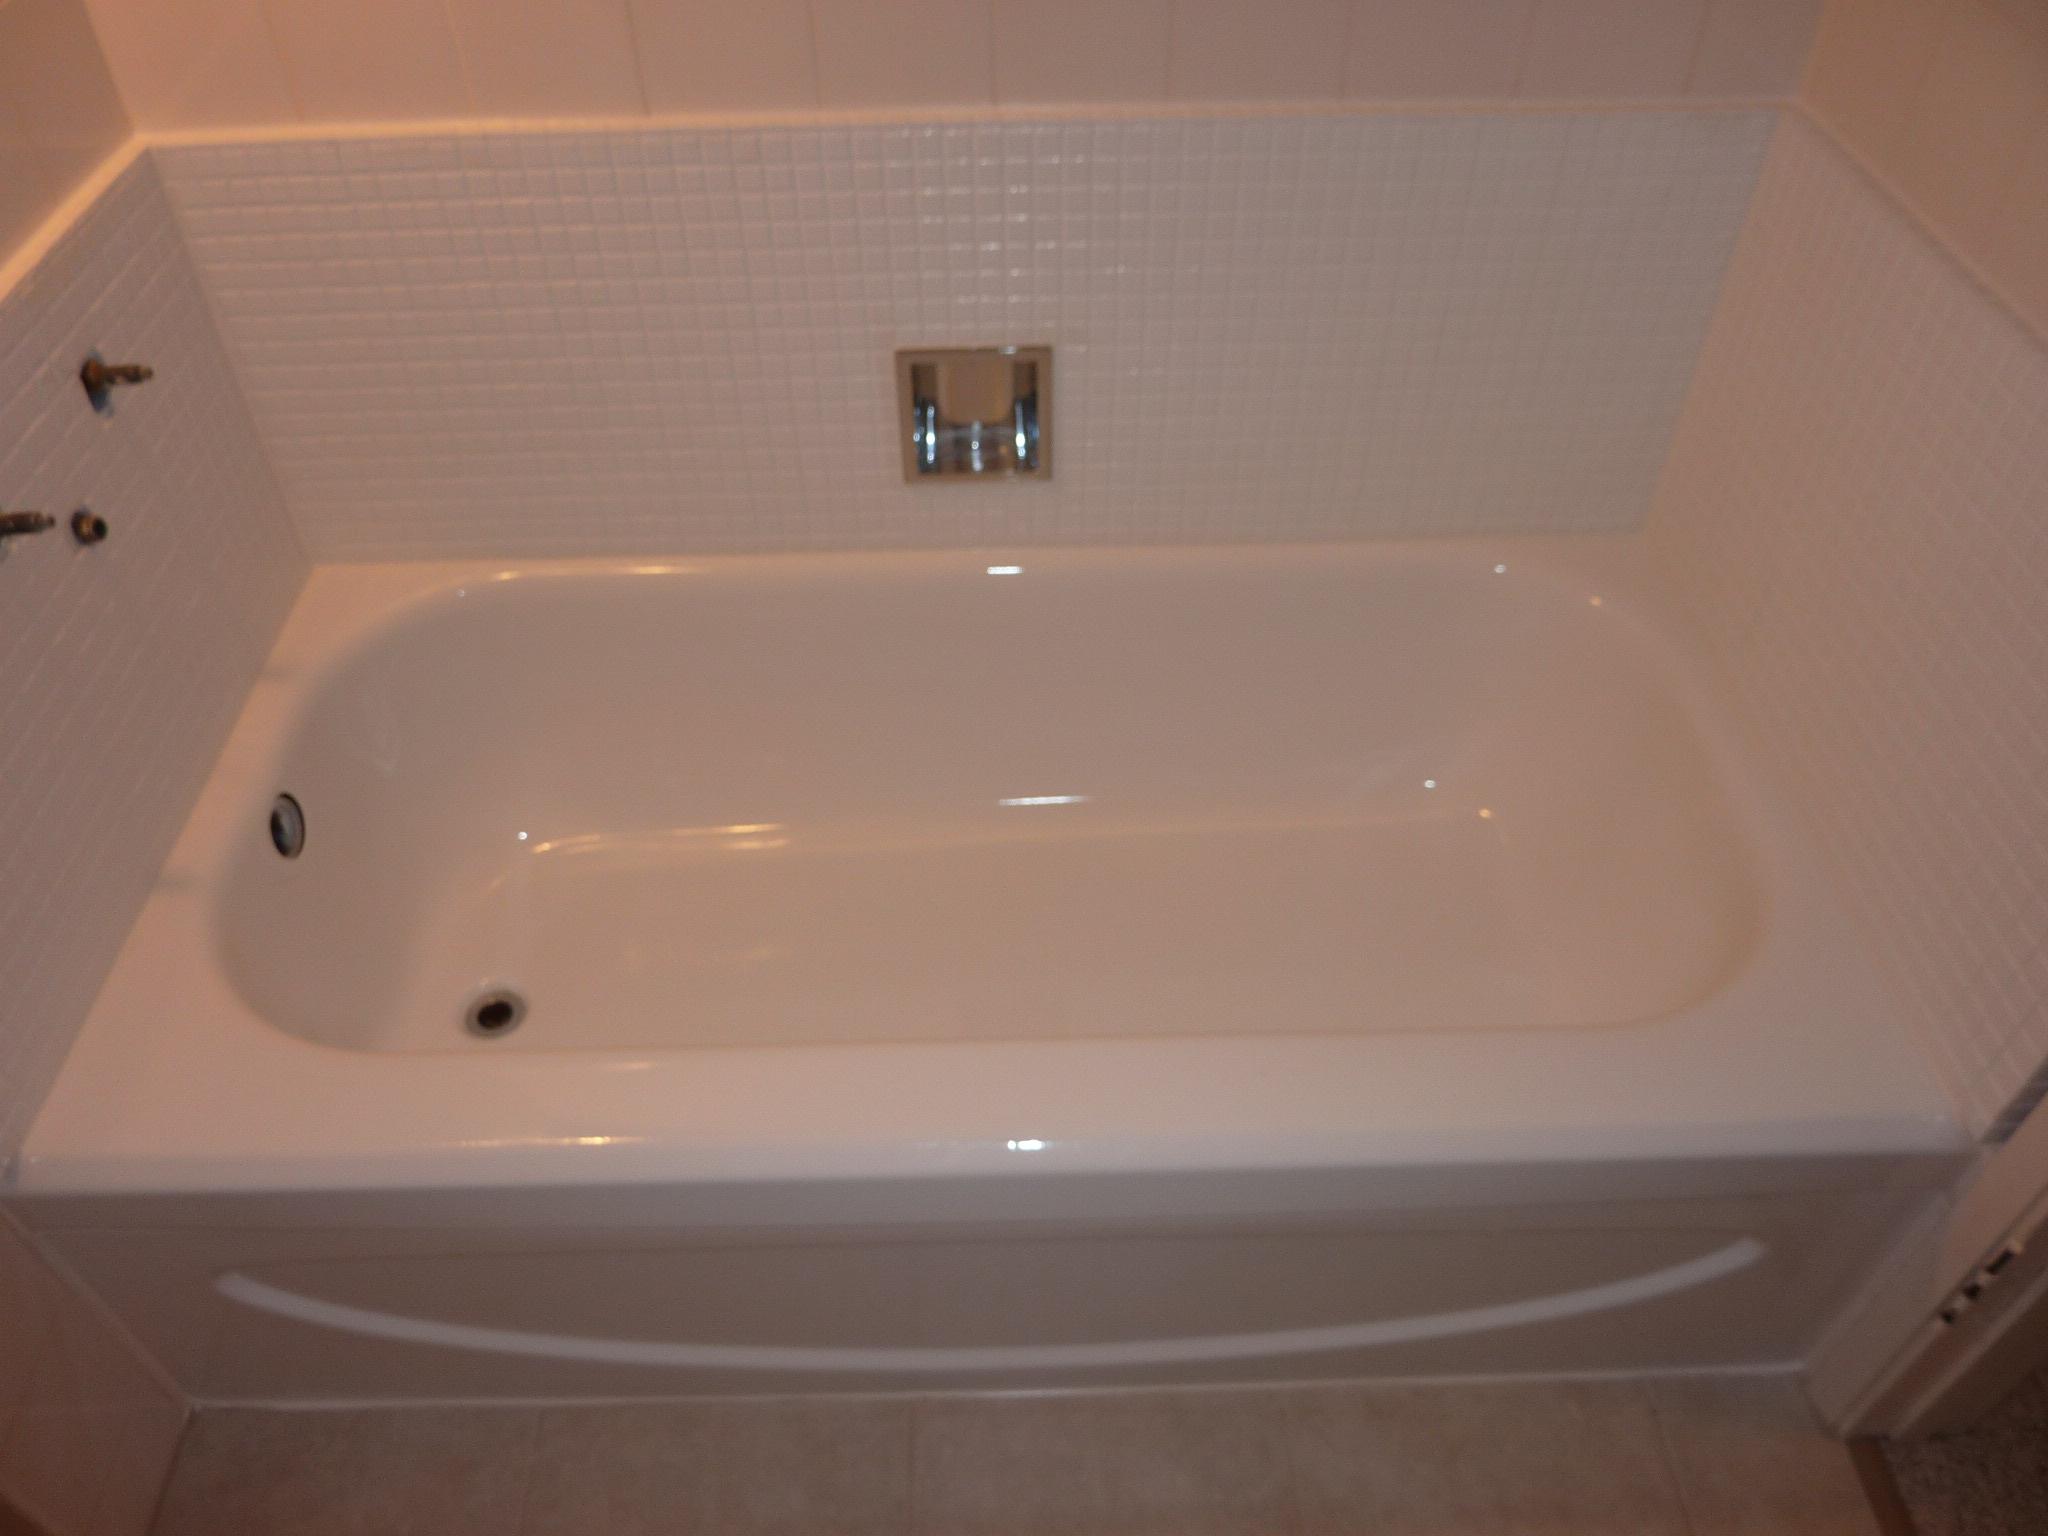 Baby Bath Tub Vancouver Boon Soak 3 Stage Bathtub B11089 Tjskids Com Vancouver Baby Super Store